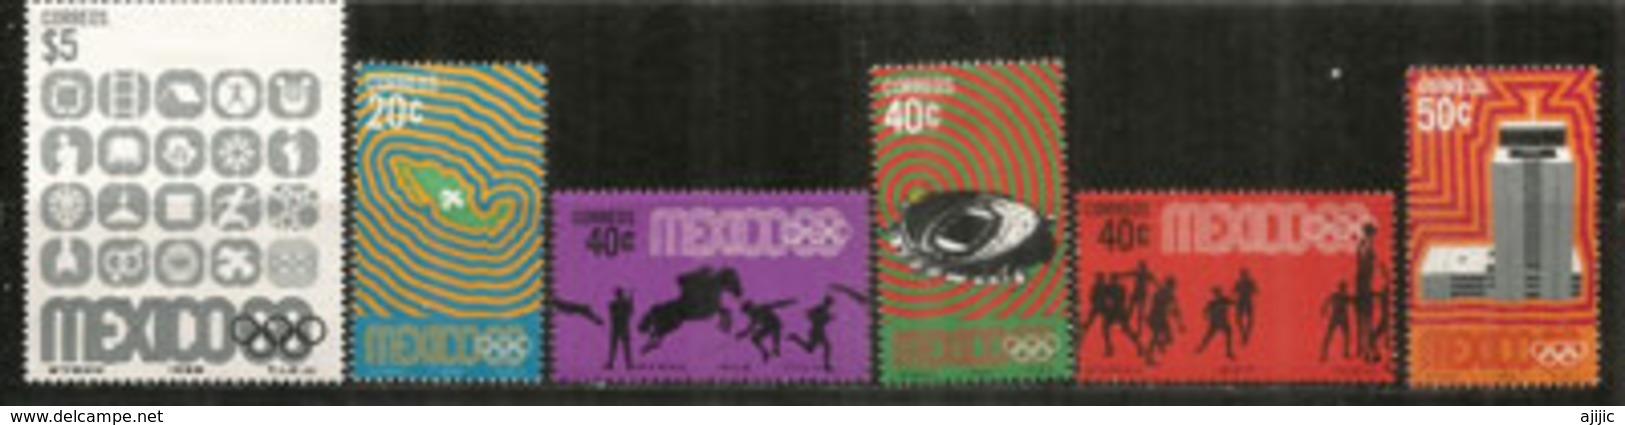 MEXIQUE. Jeux Olympiques De Mexico 1968.  6 Timbres Neufs ** - Zomer 1968: Mexico-City